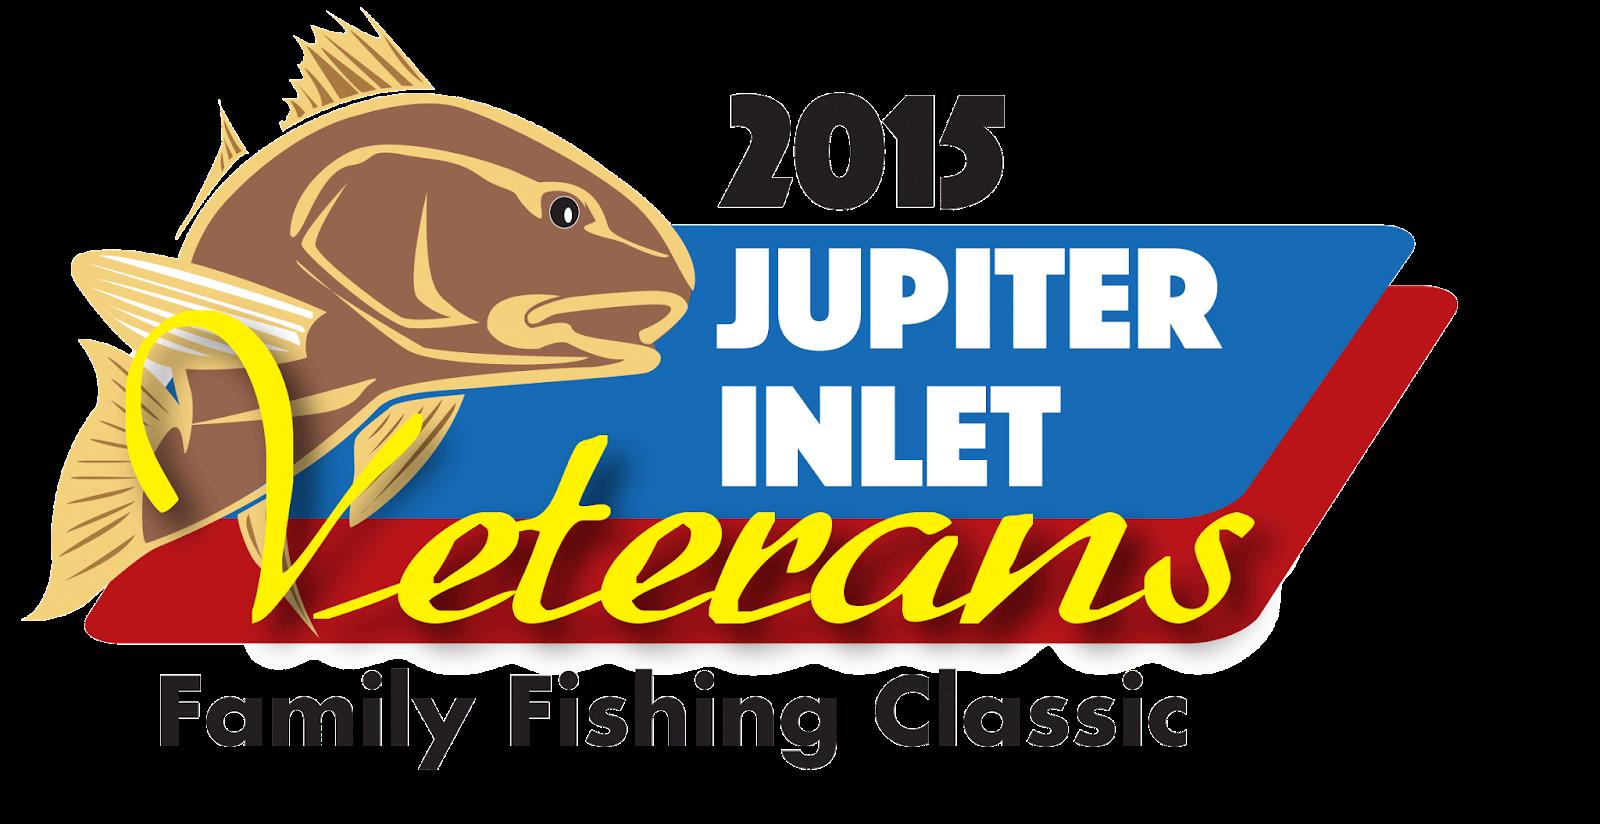 JupiterInlet_2015_VeteransFishingClassic_logo_layout_1.png